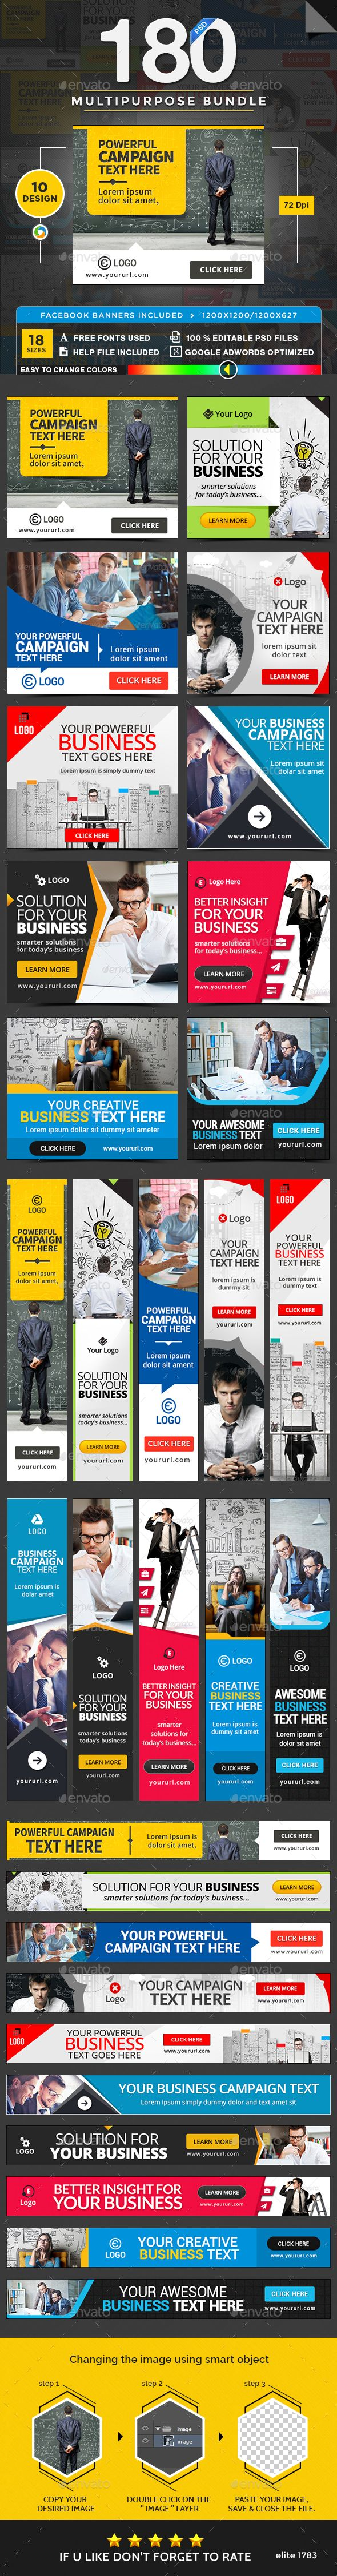 Multipurpose Banners Design Template Bundle 10 Sets - 180 Banners - Banners & Ads Web Element Template PSD. Download here: https://graphicriver.net/item/multipurpose-banners-bundle-10-sets-180-banners/17728345?s_rank=26&ref=yinkira